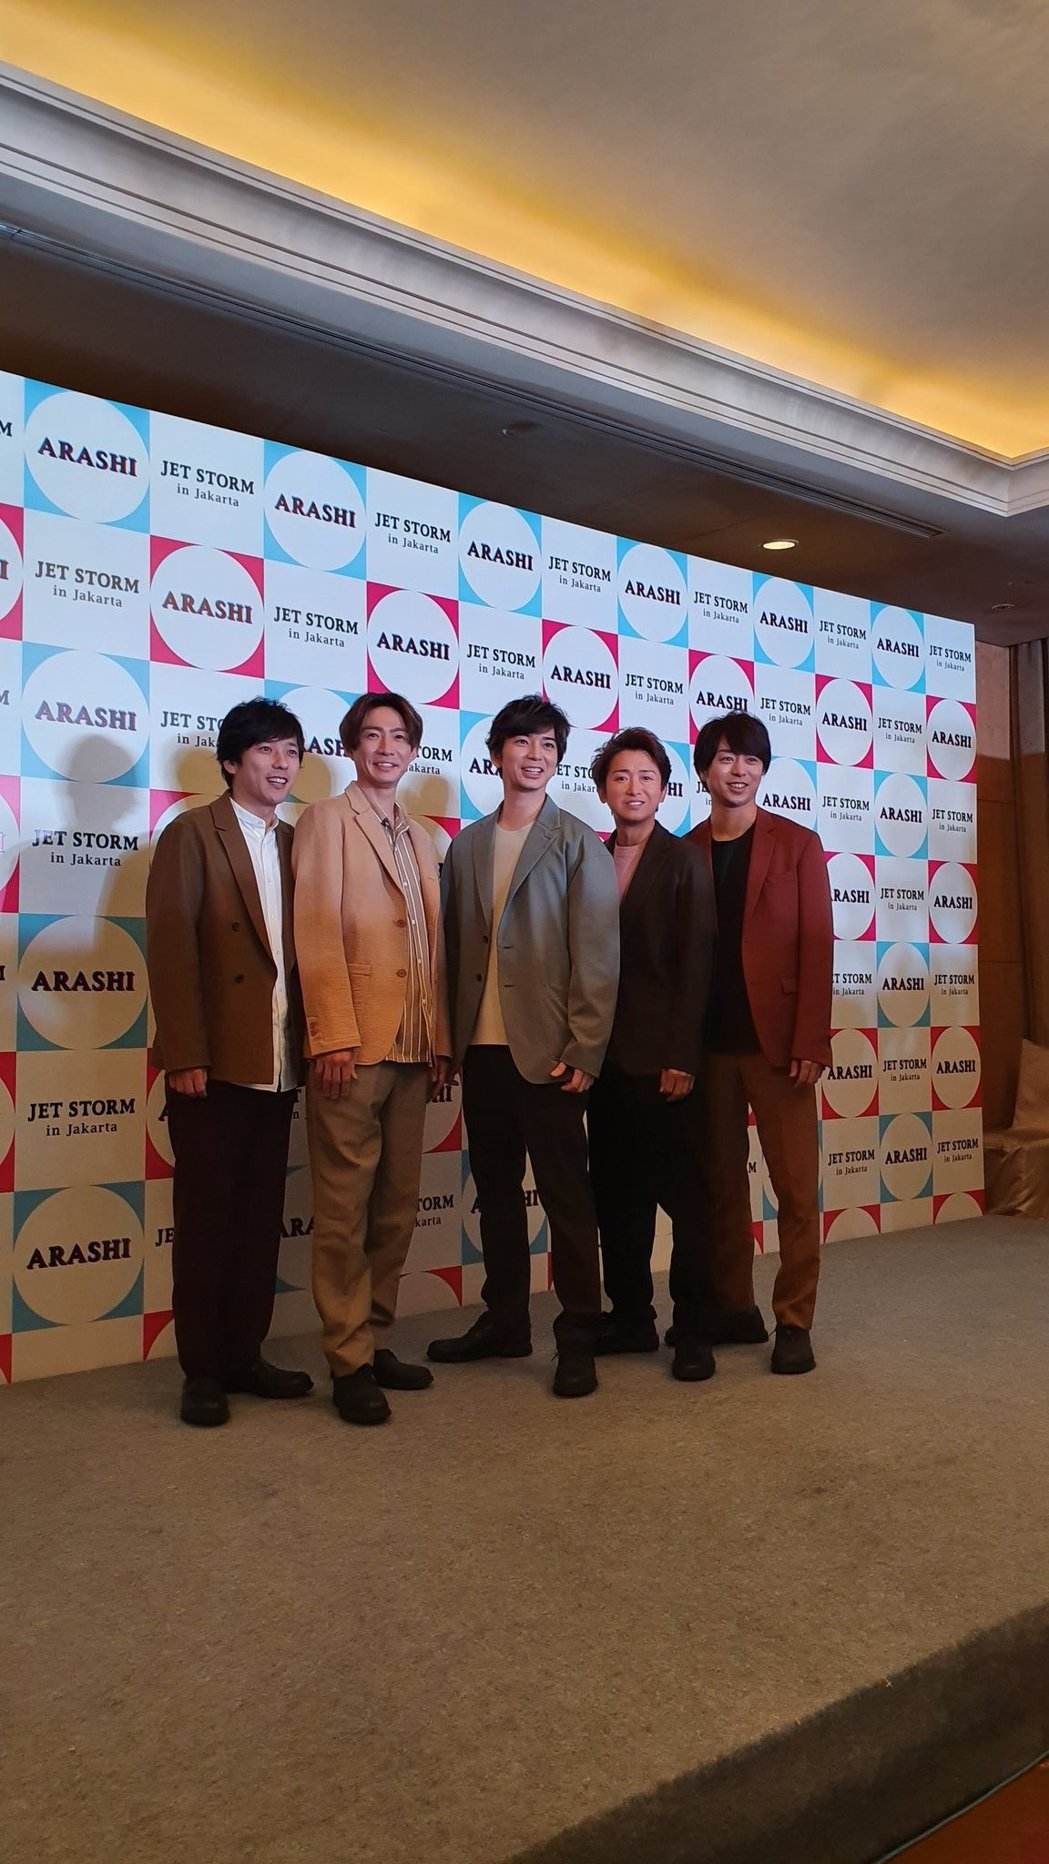 ARASHI首站抵達印尼。圖/摘自微博